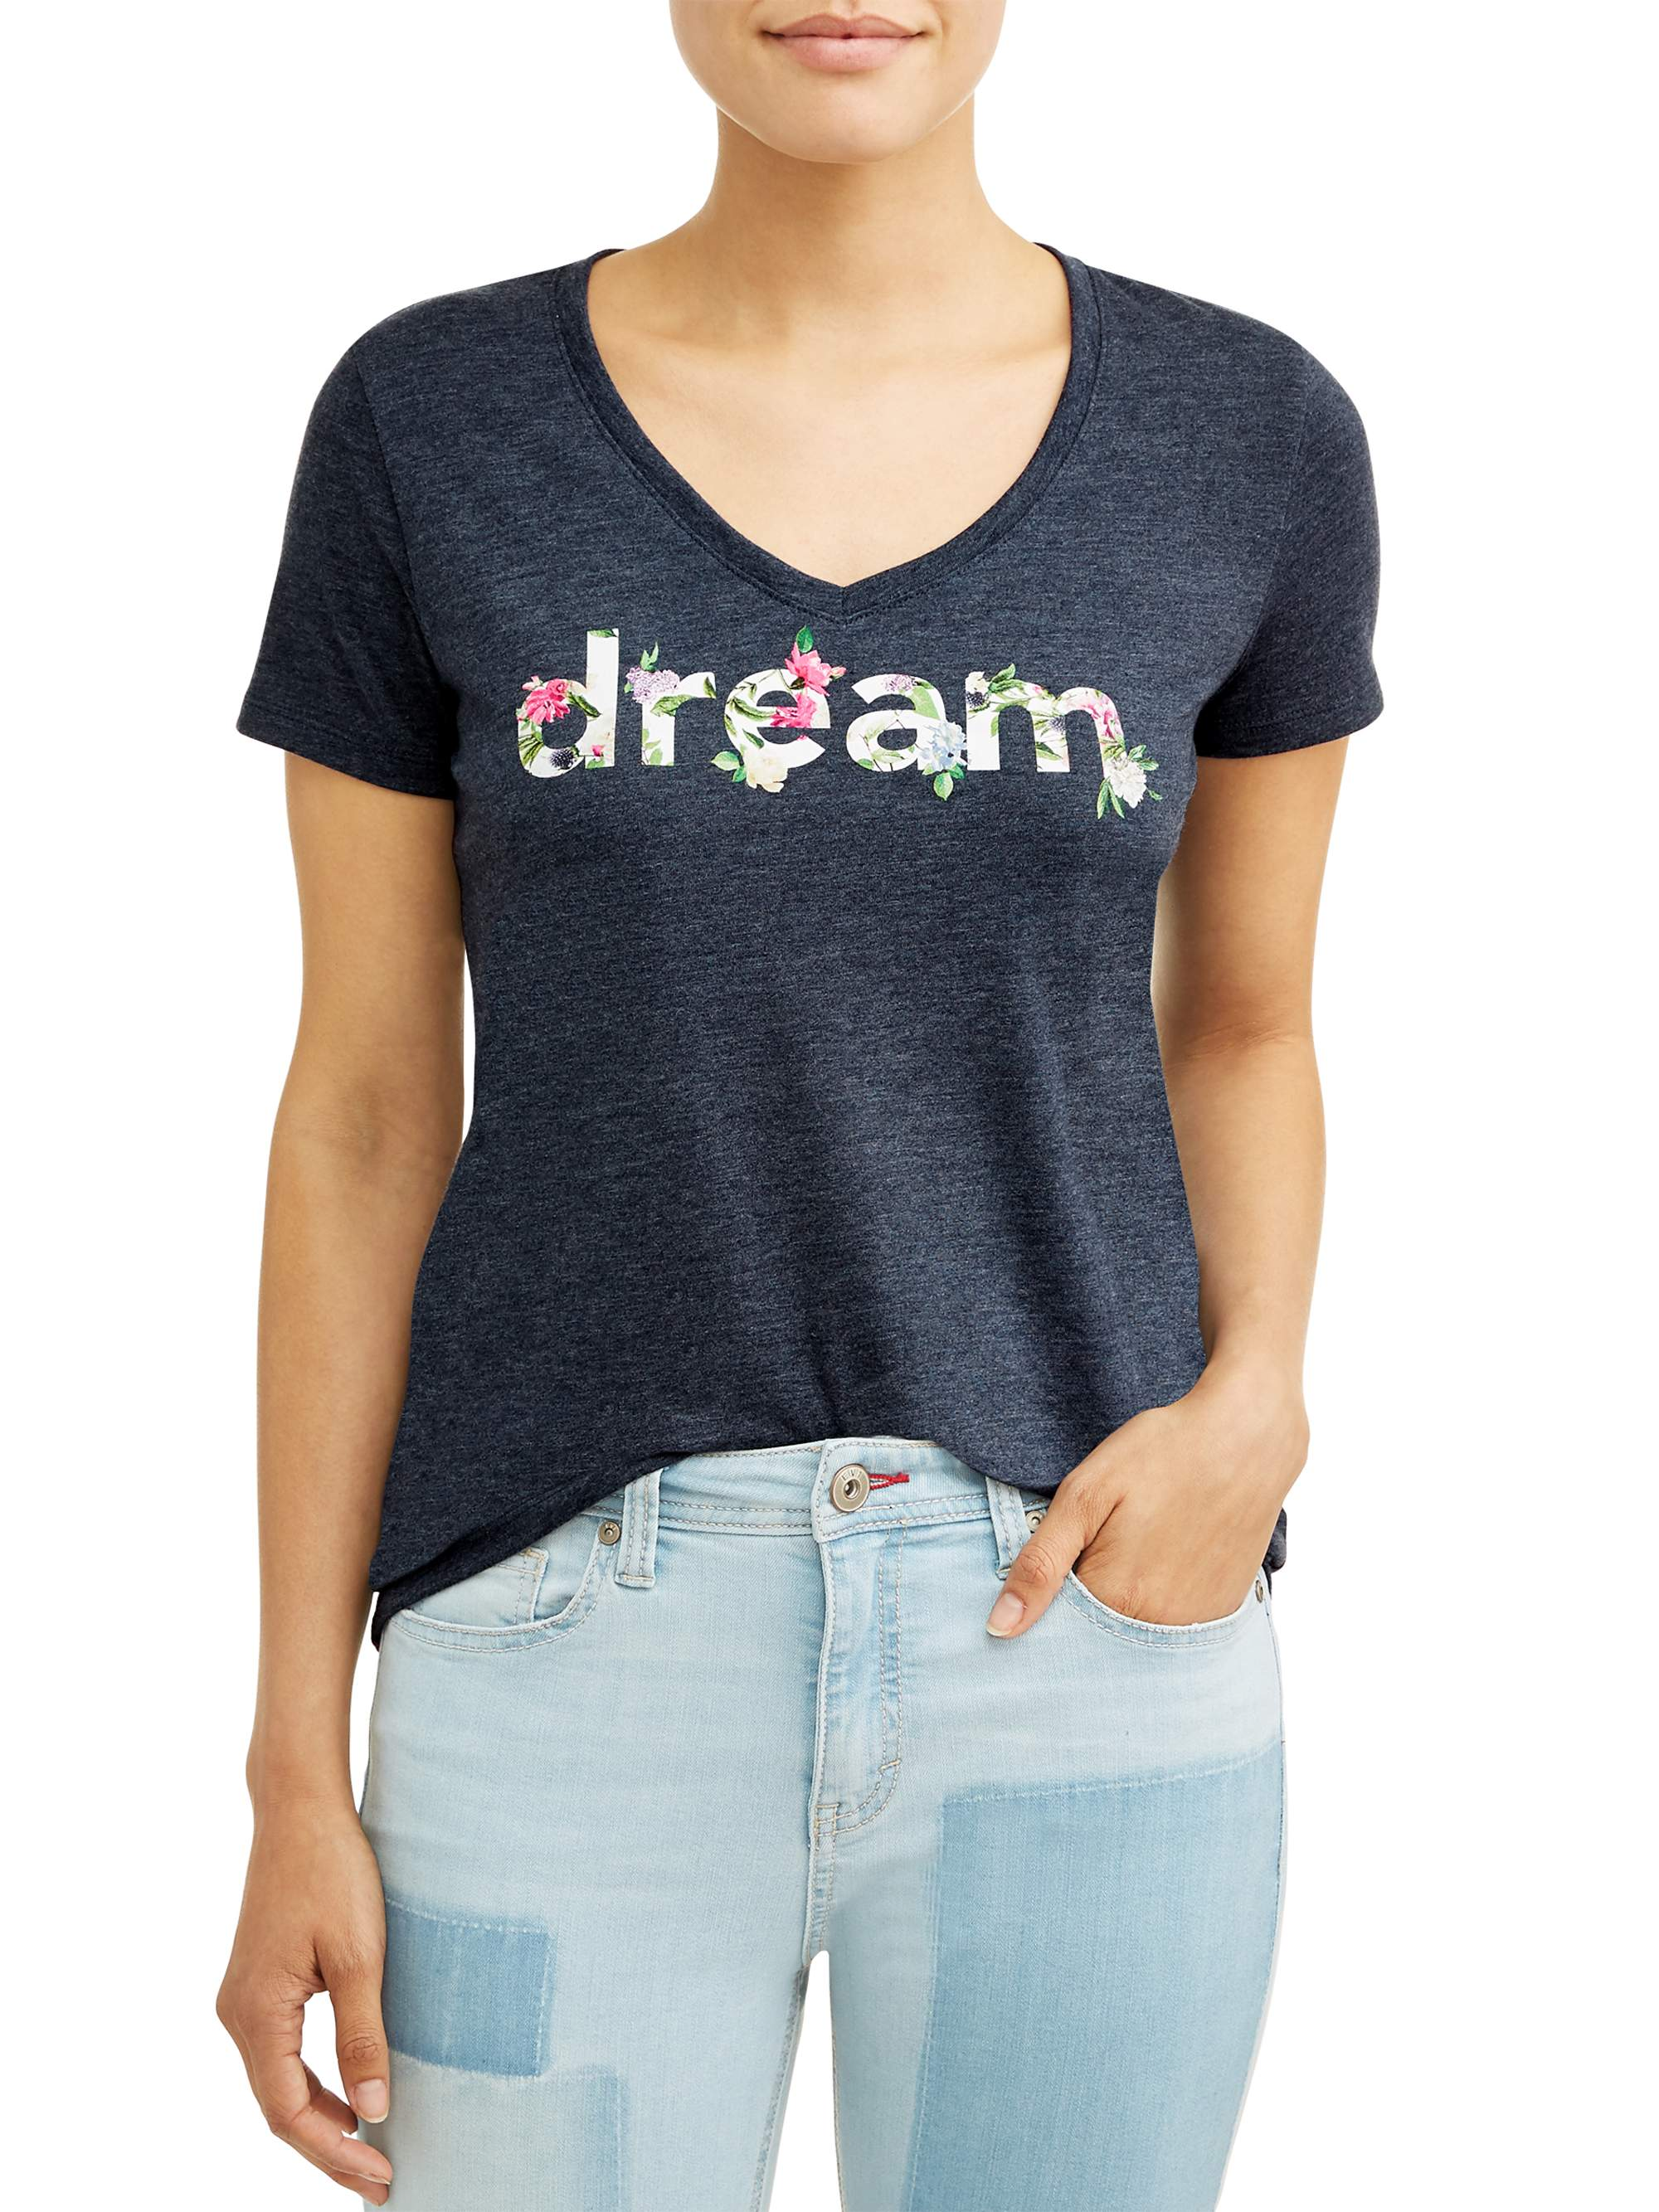 Dream Short Sleeve Graphic T-Shirt Women's